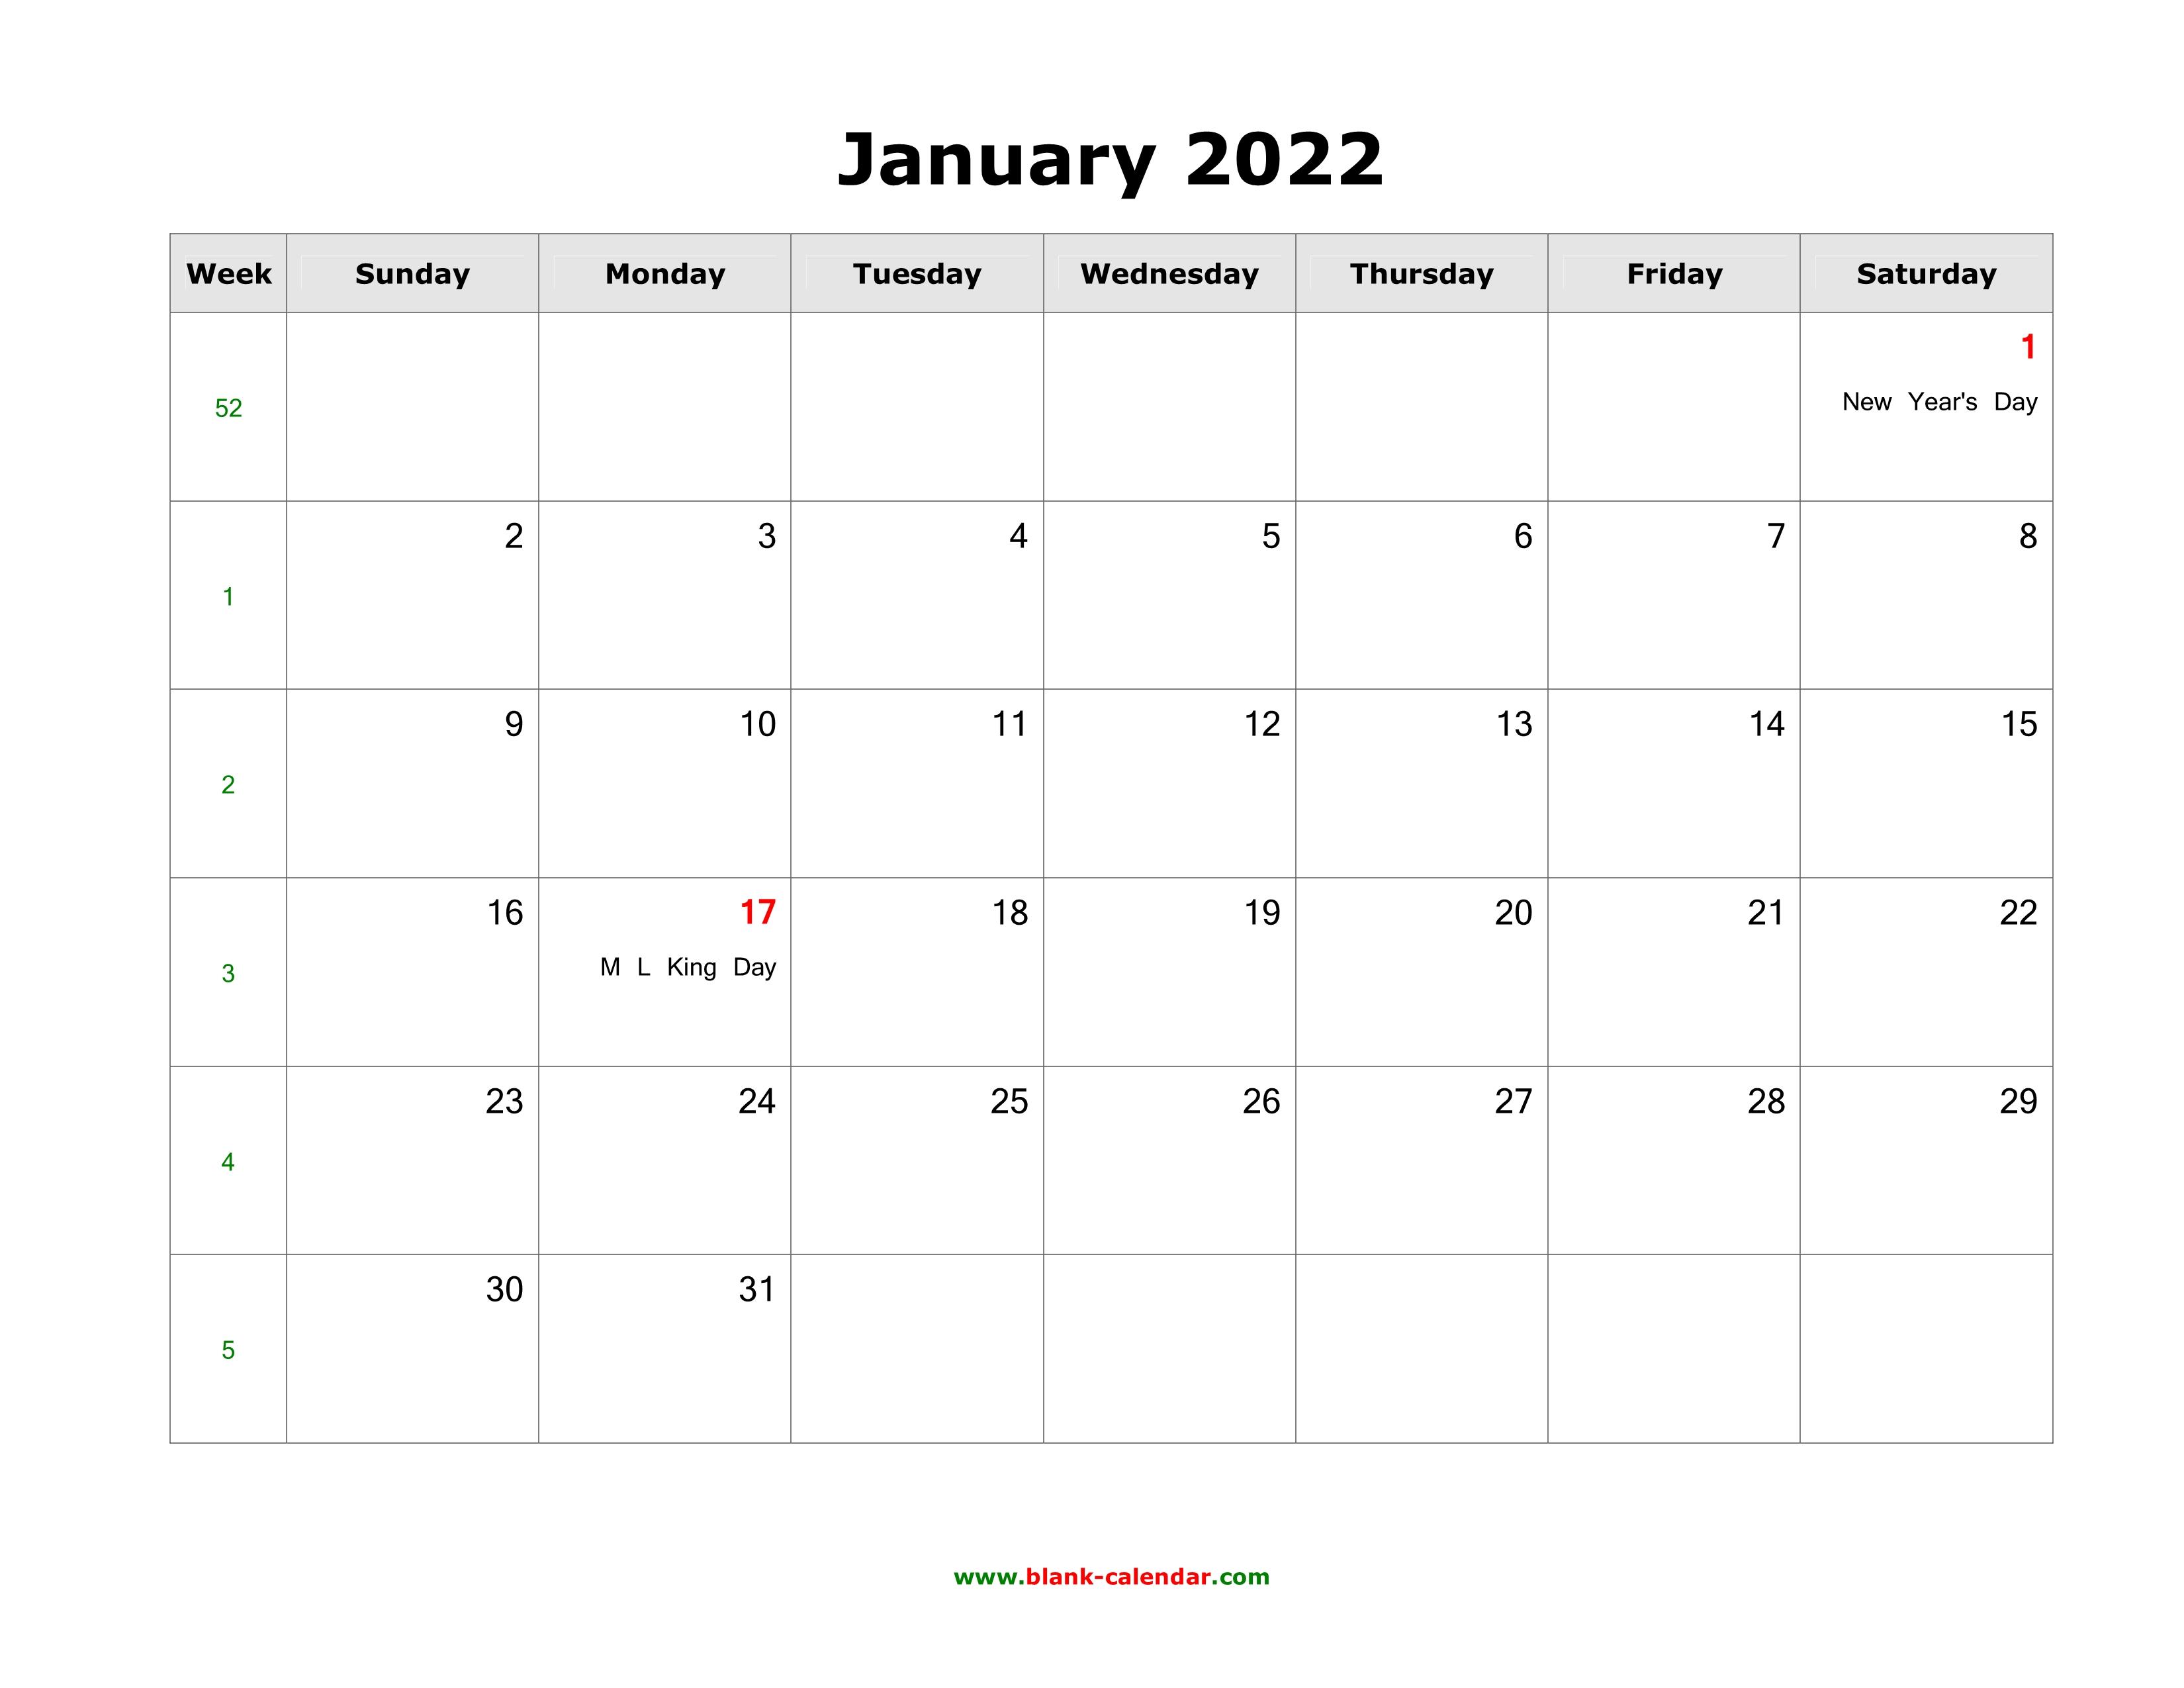 January 2022 Blank Calendar.January 2022 Blank Calendar Free Download Calendar Templates